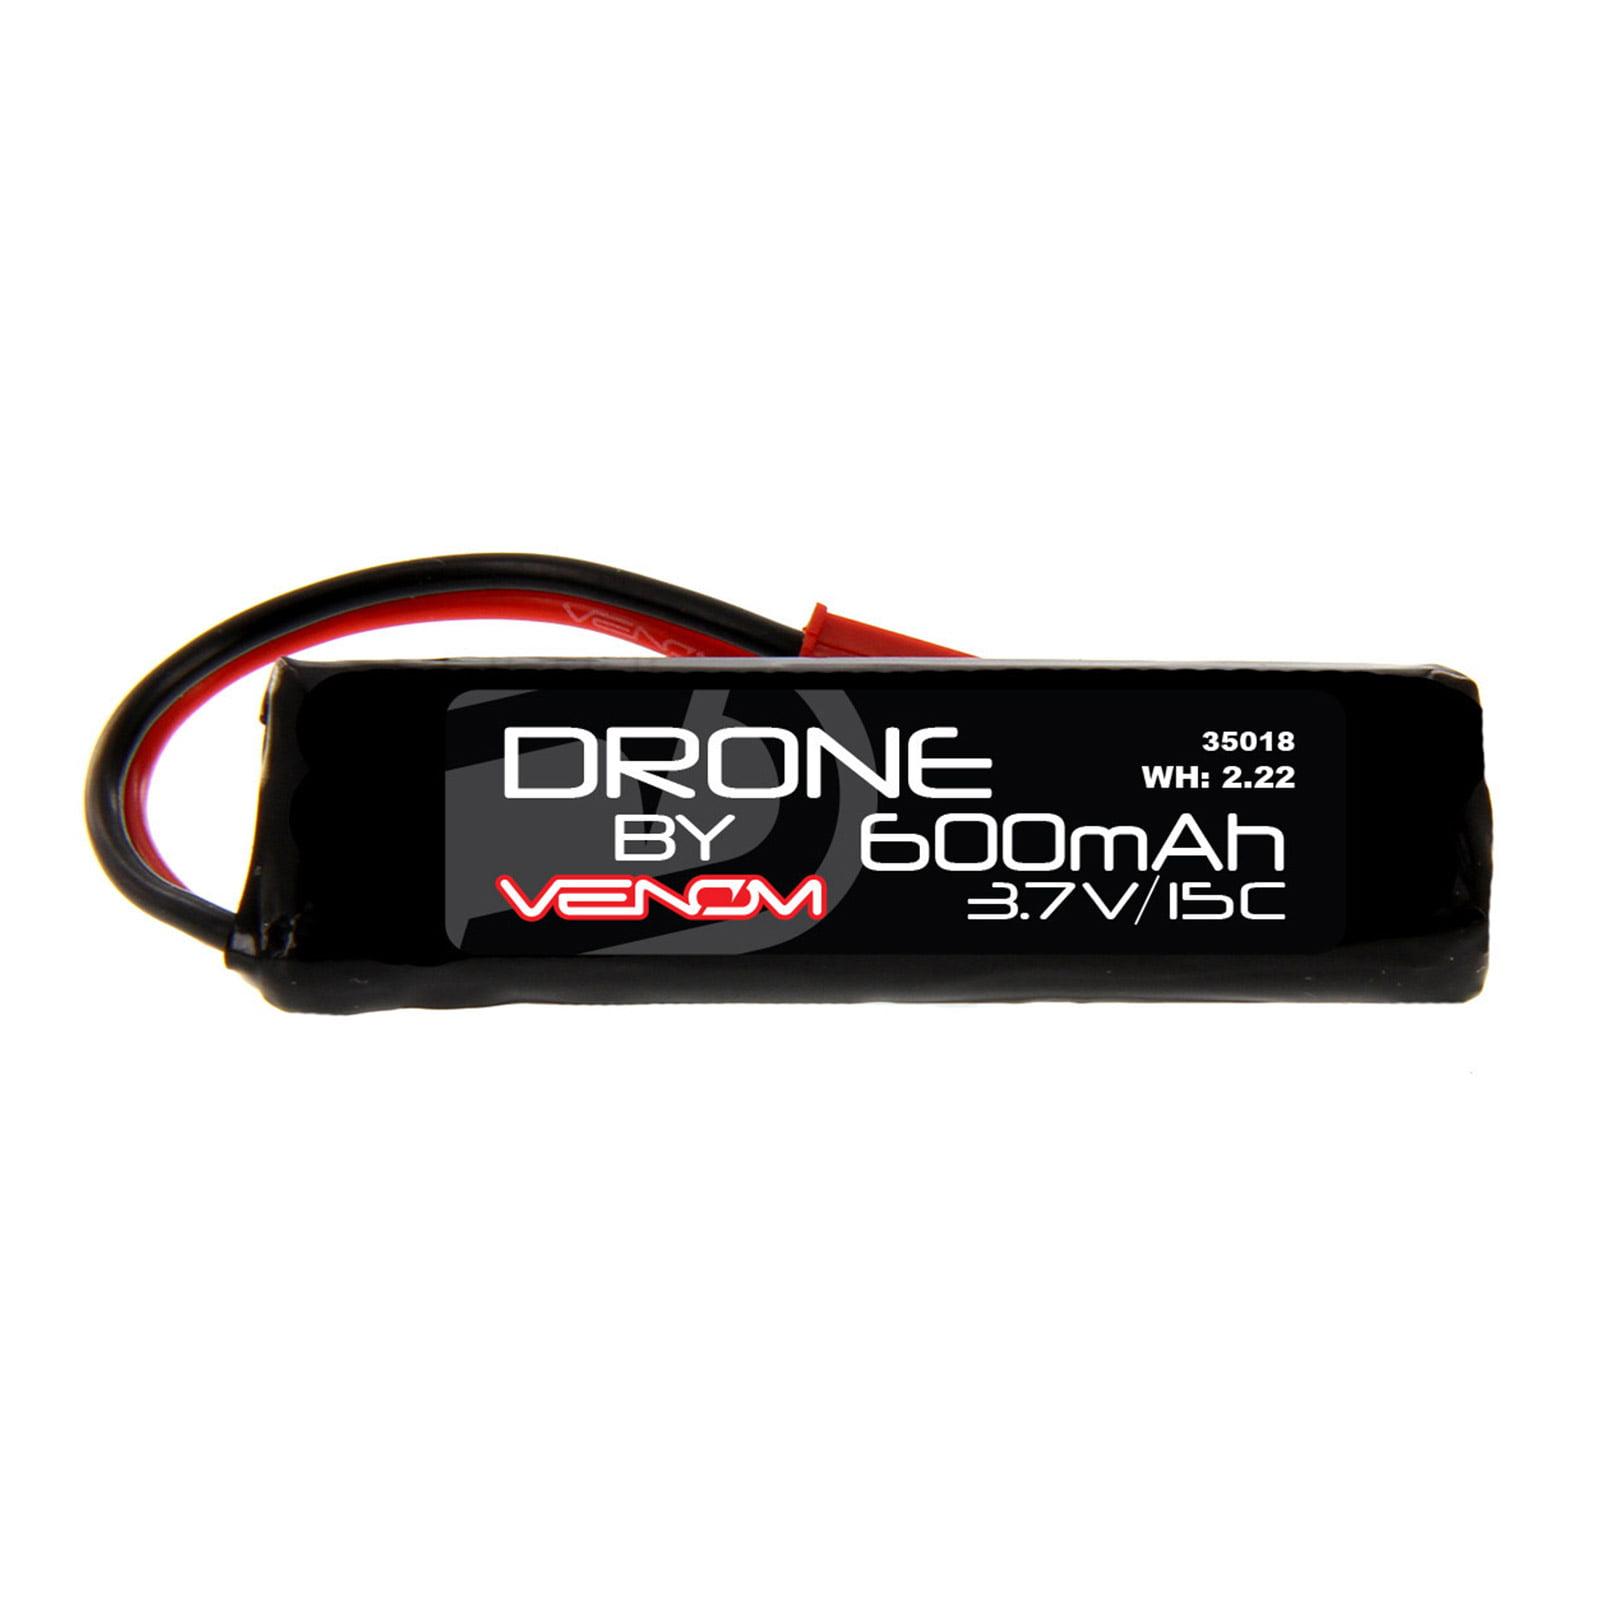 WL Toys V989 Bullet 15C 1S 600mAh 3.7V LiPo Drone Battery with JST plug by Venom